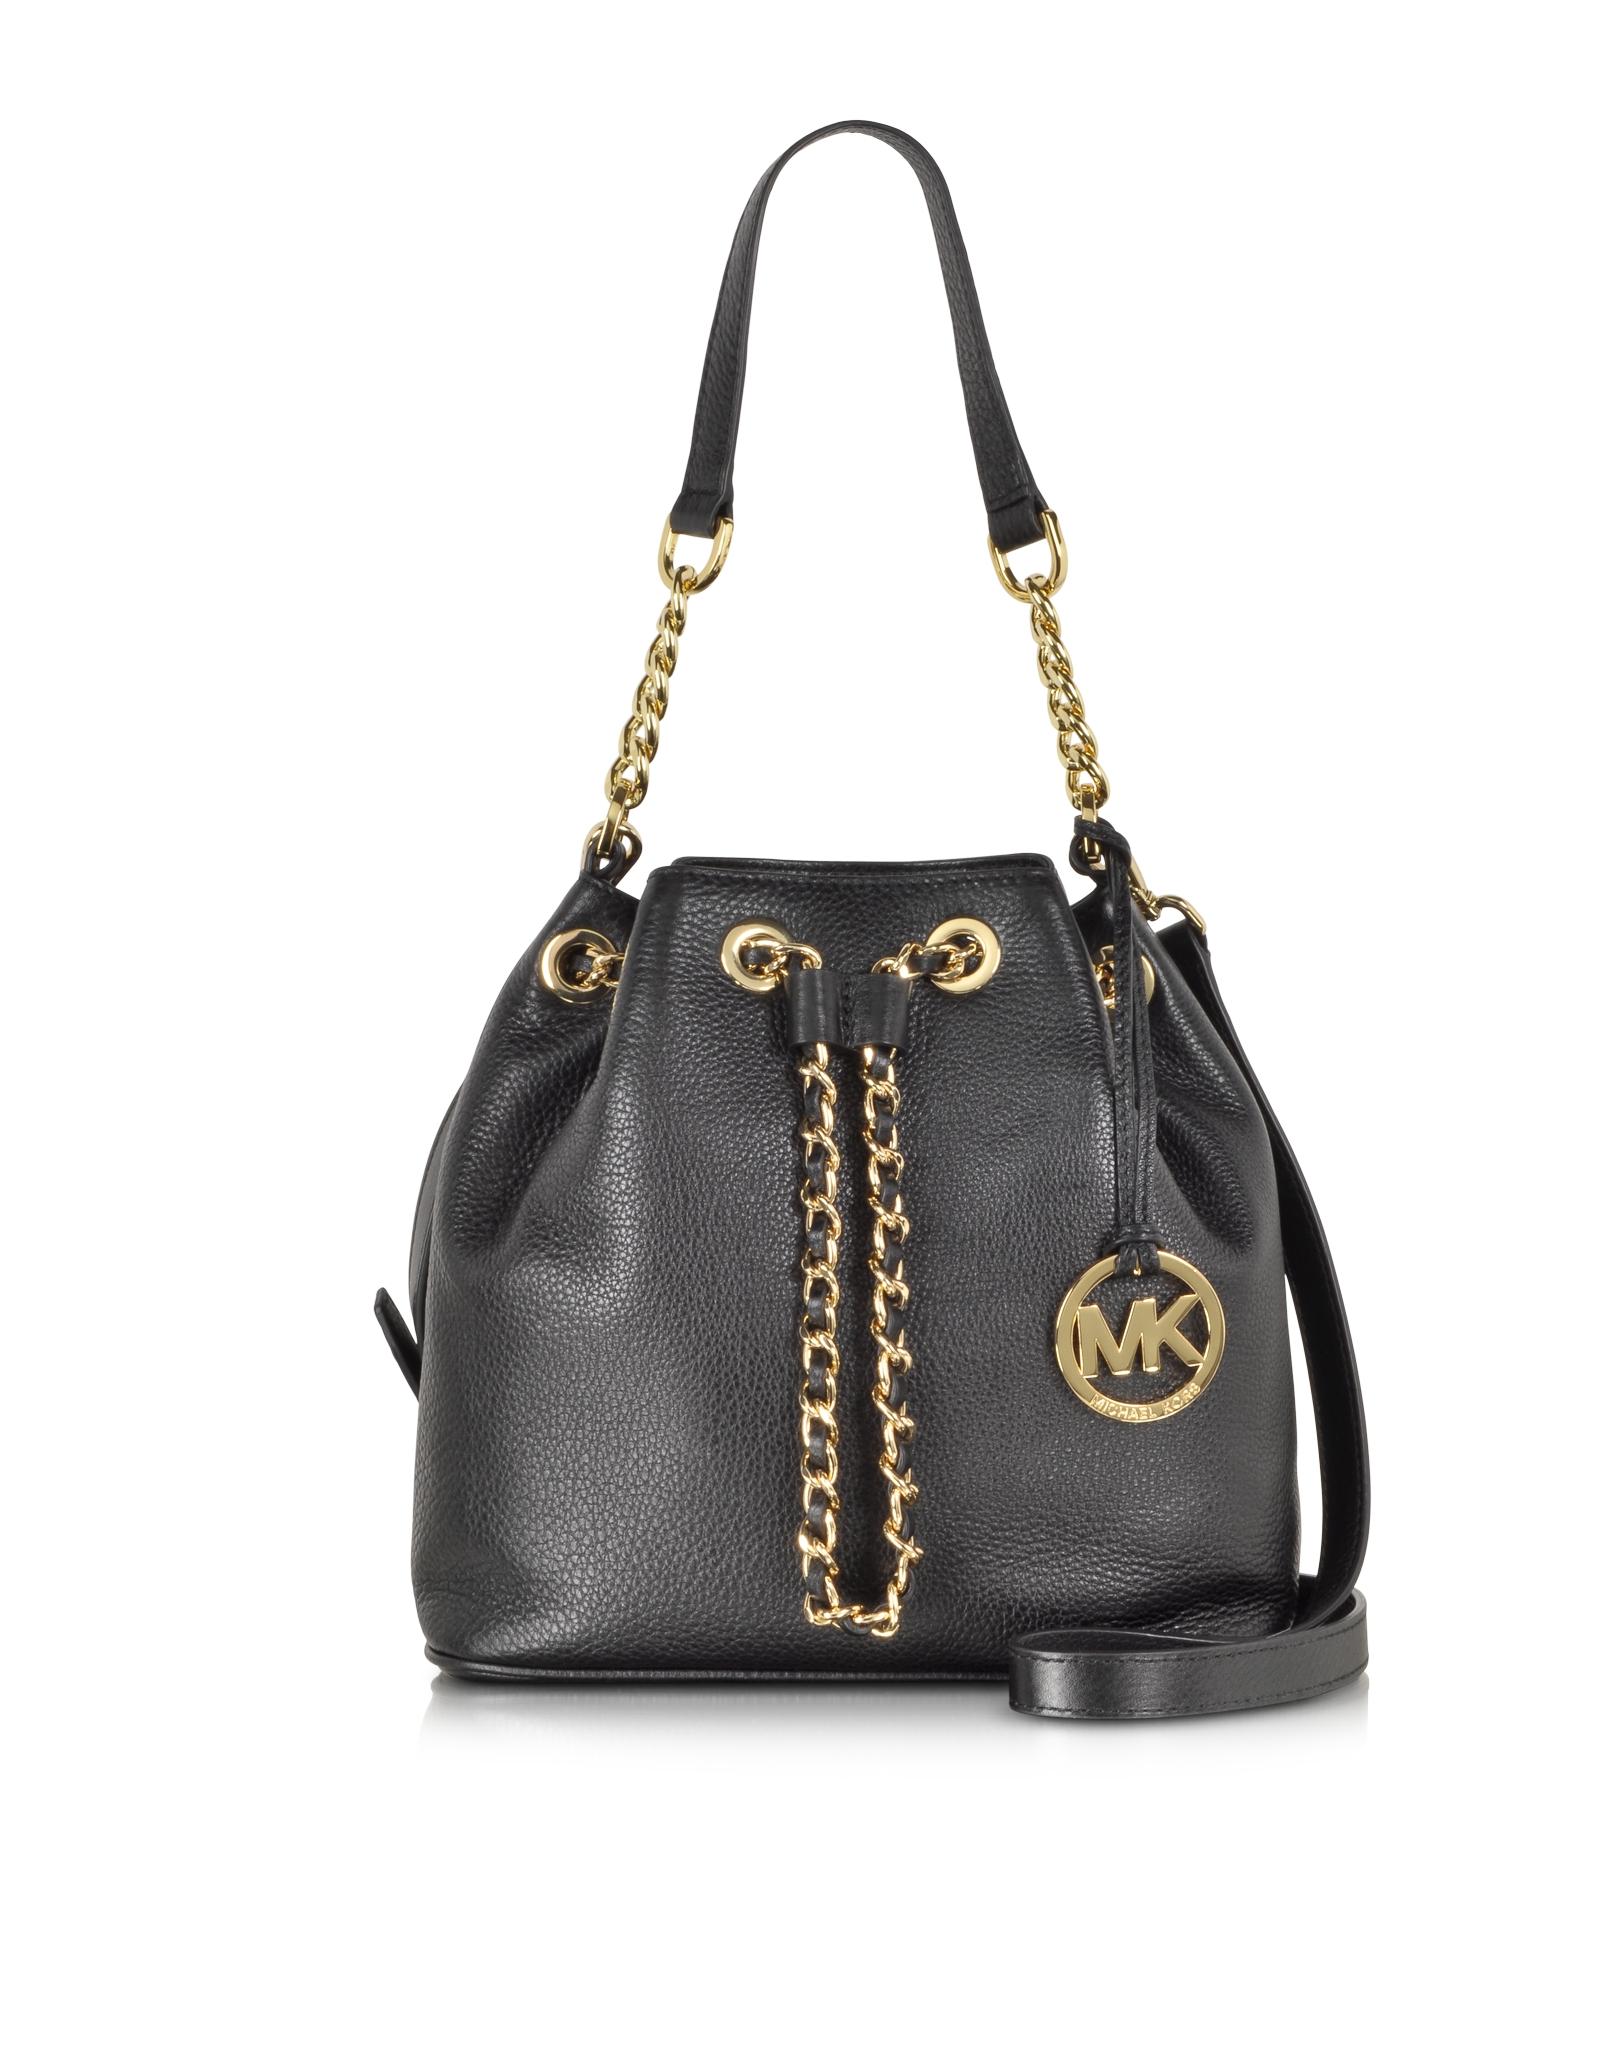 e47a47fc024e Michael Kors Frankie Black Leather Medium Messenger in Black - Lyst